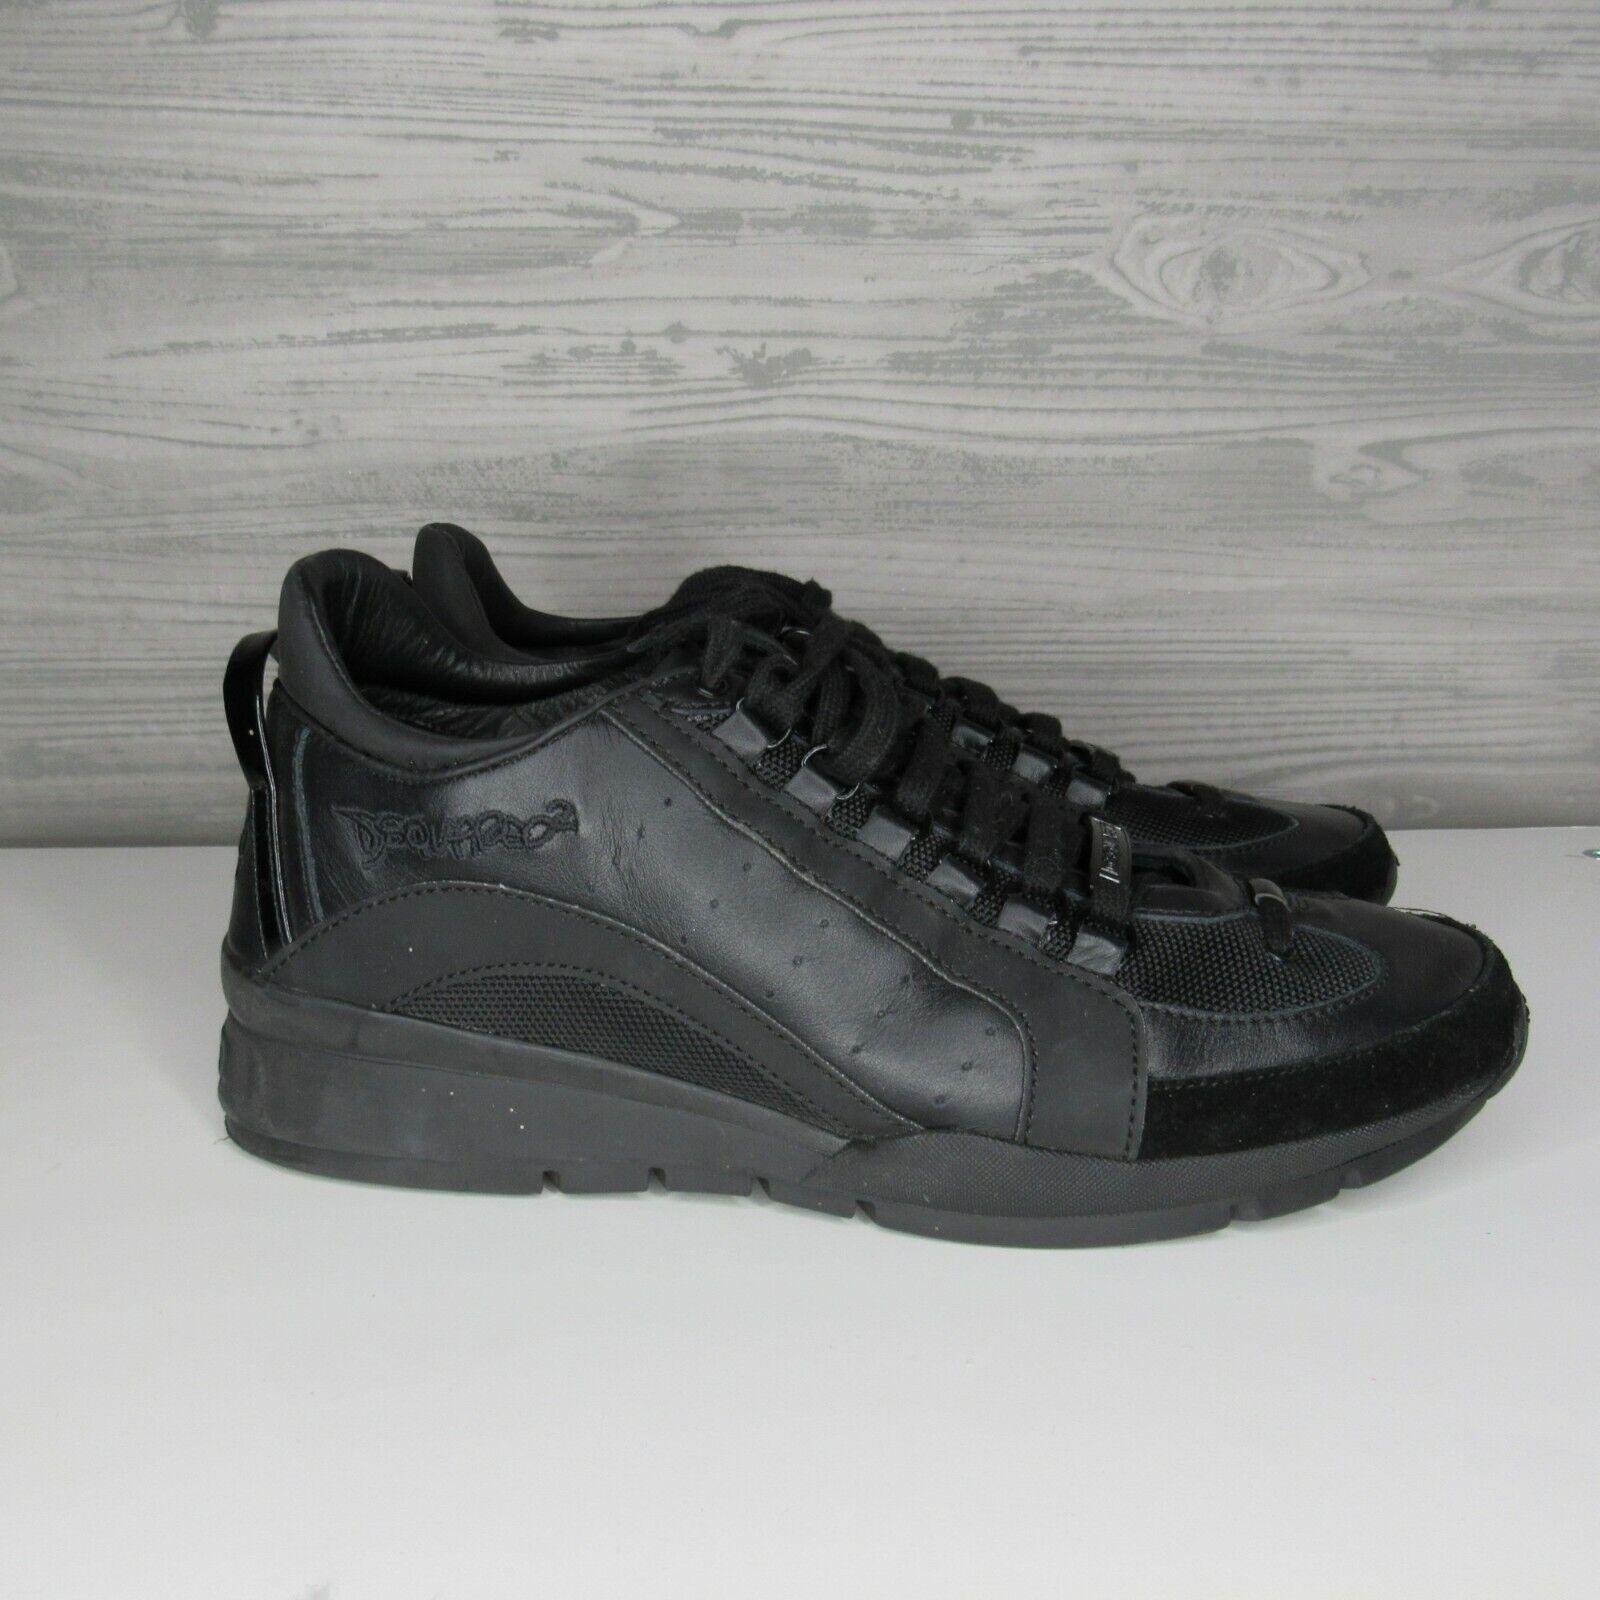 Dsquared2 sneakers men 551,0